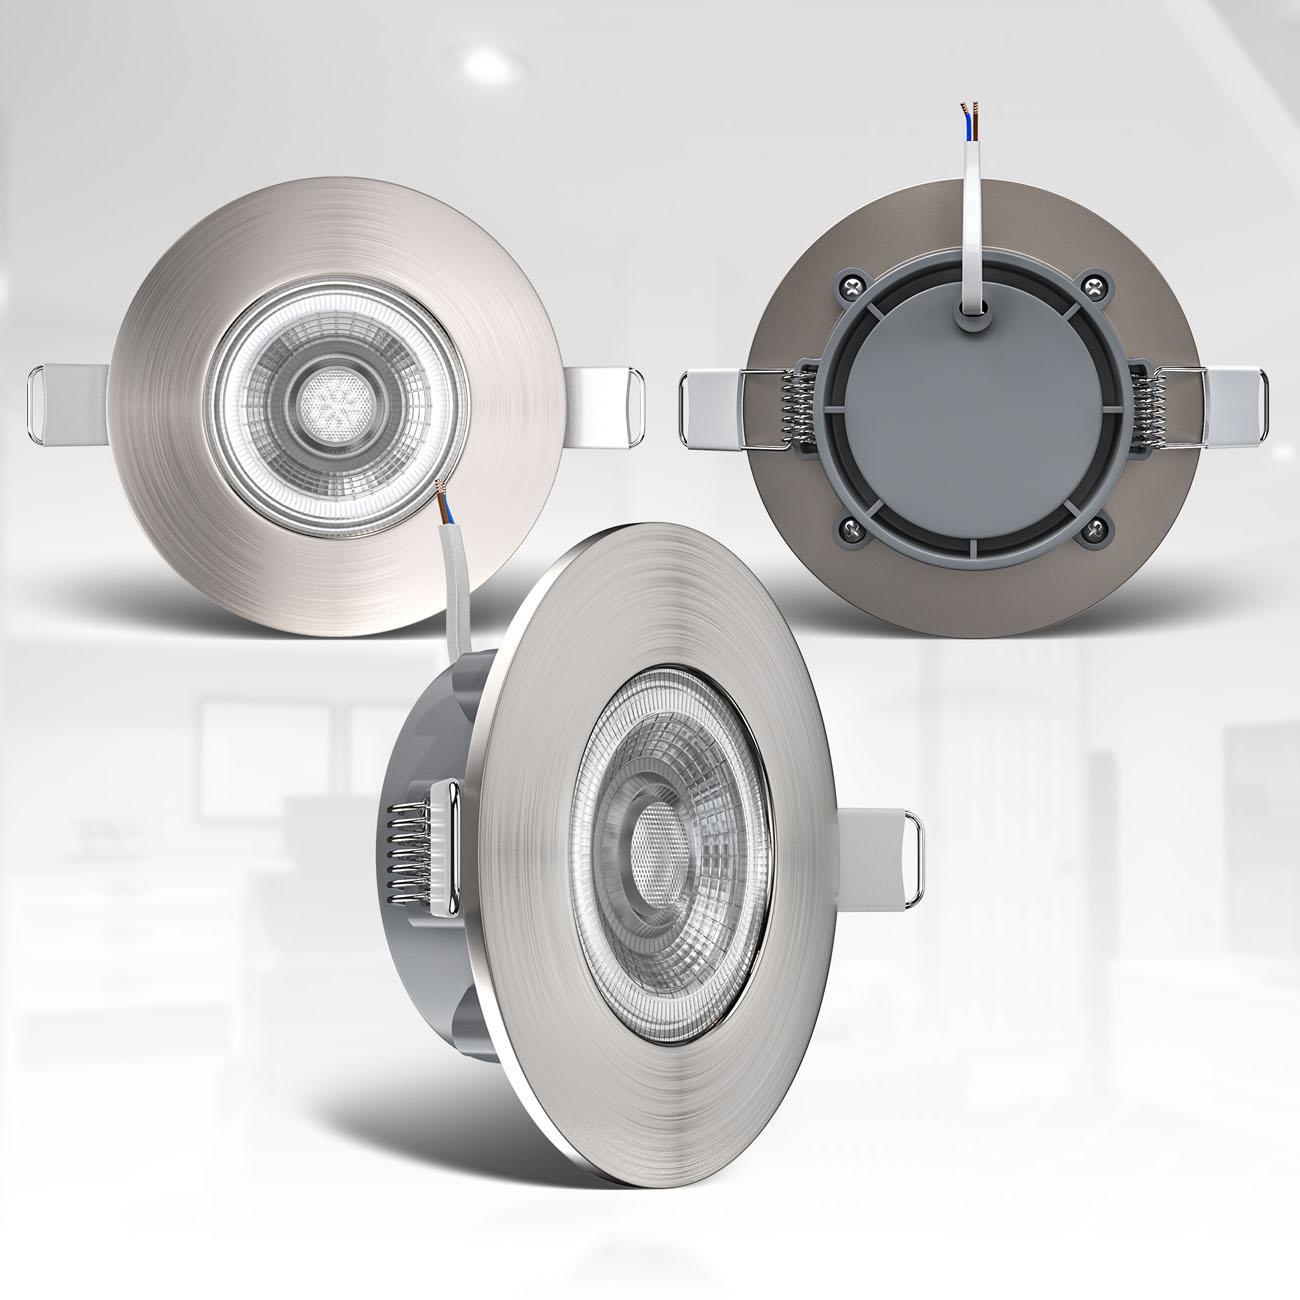 LED Einbaustrahler | Bad Einbauleuchte 3er SET | ultra flach 5W IP44 dimmbar - 6